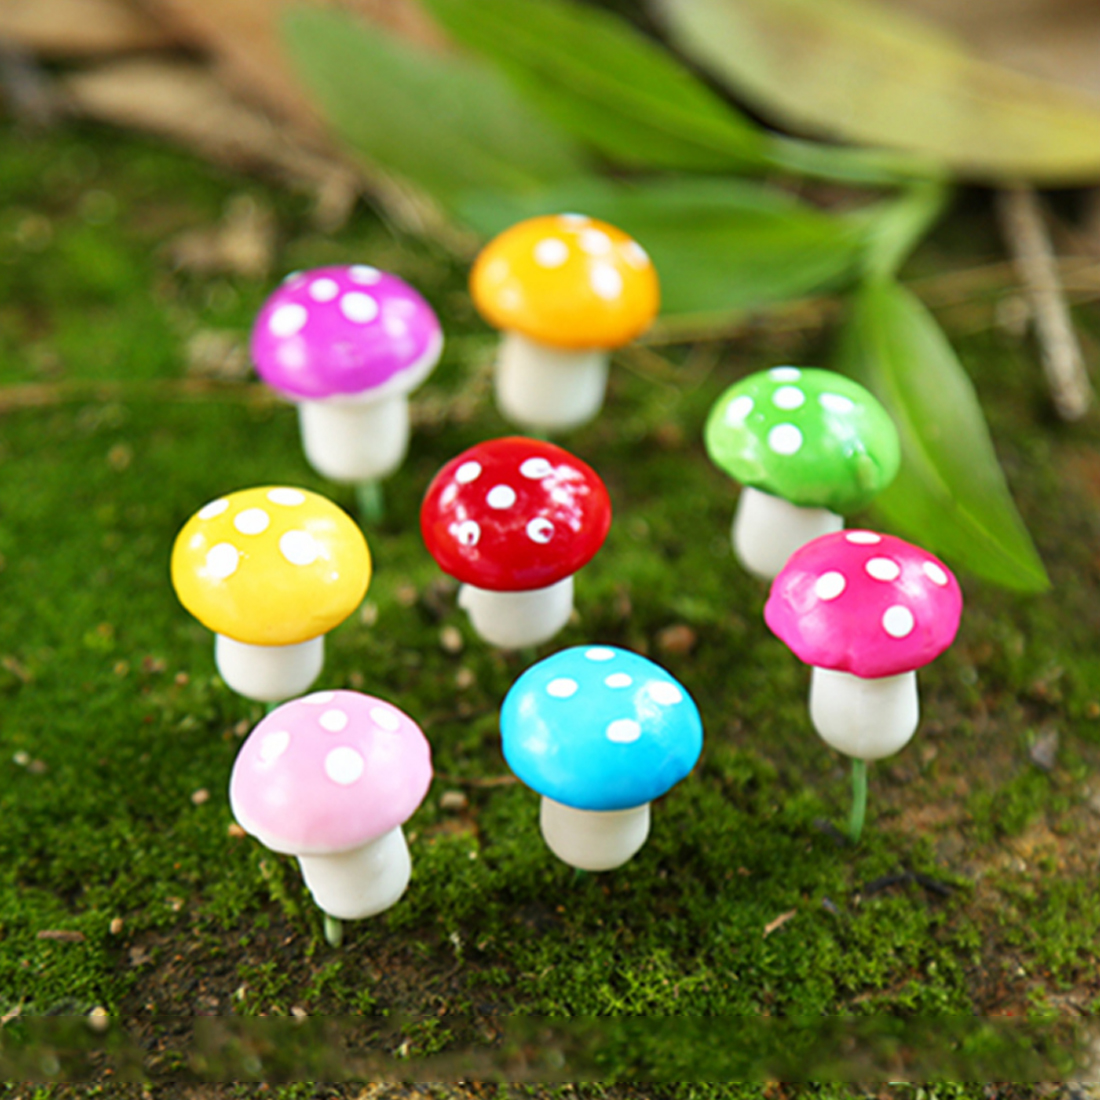 Gardening Decor 10pcs Mini Red Mushroom Garden Ornament Miniature